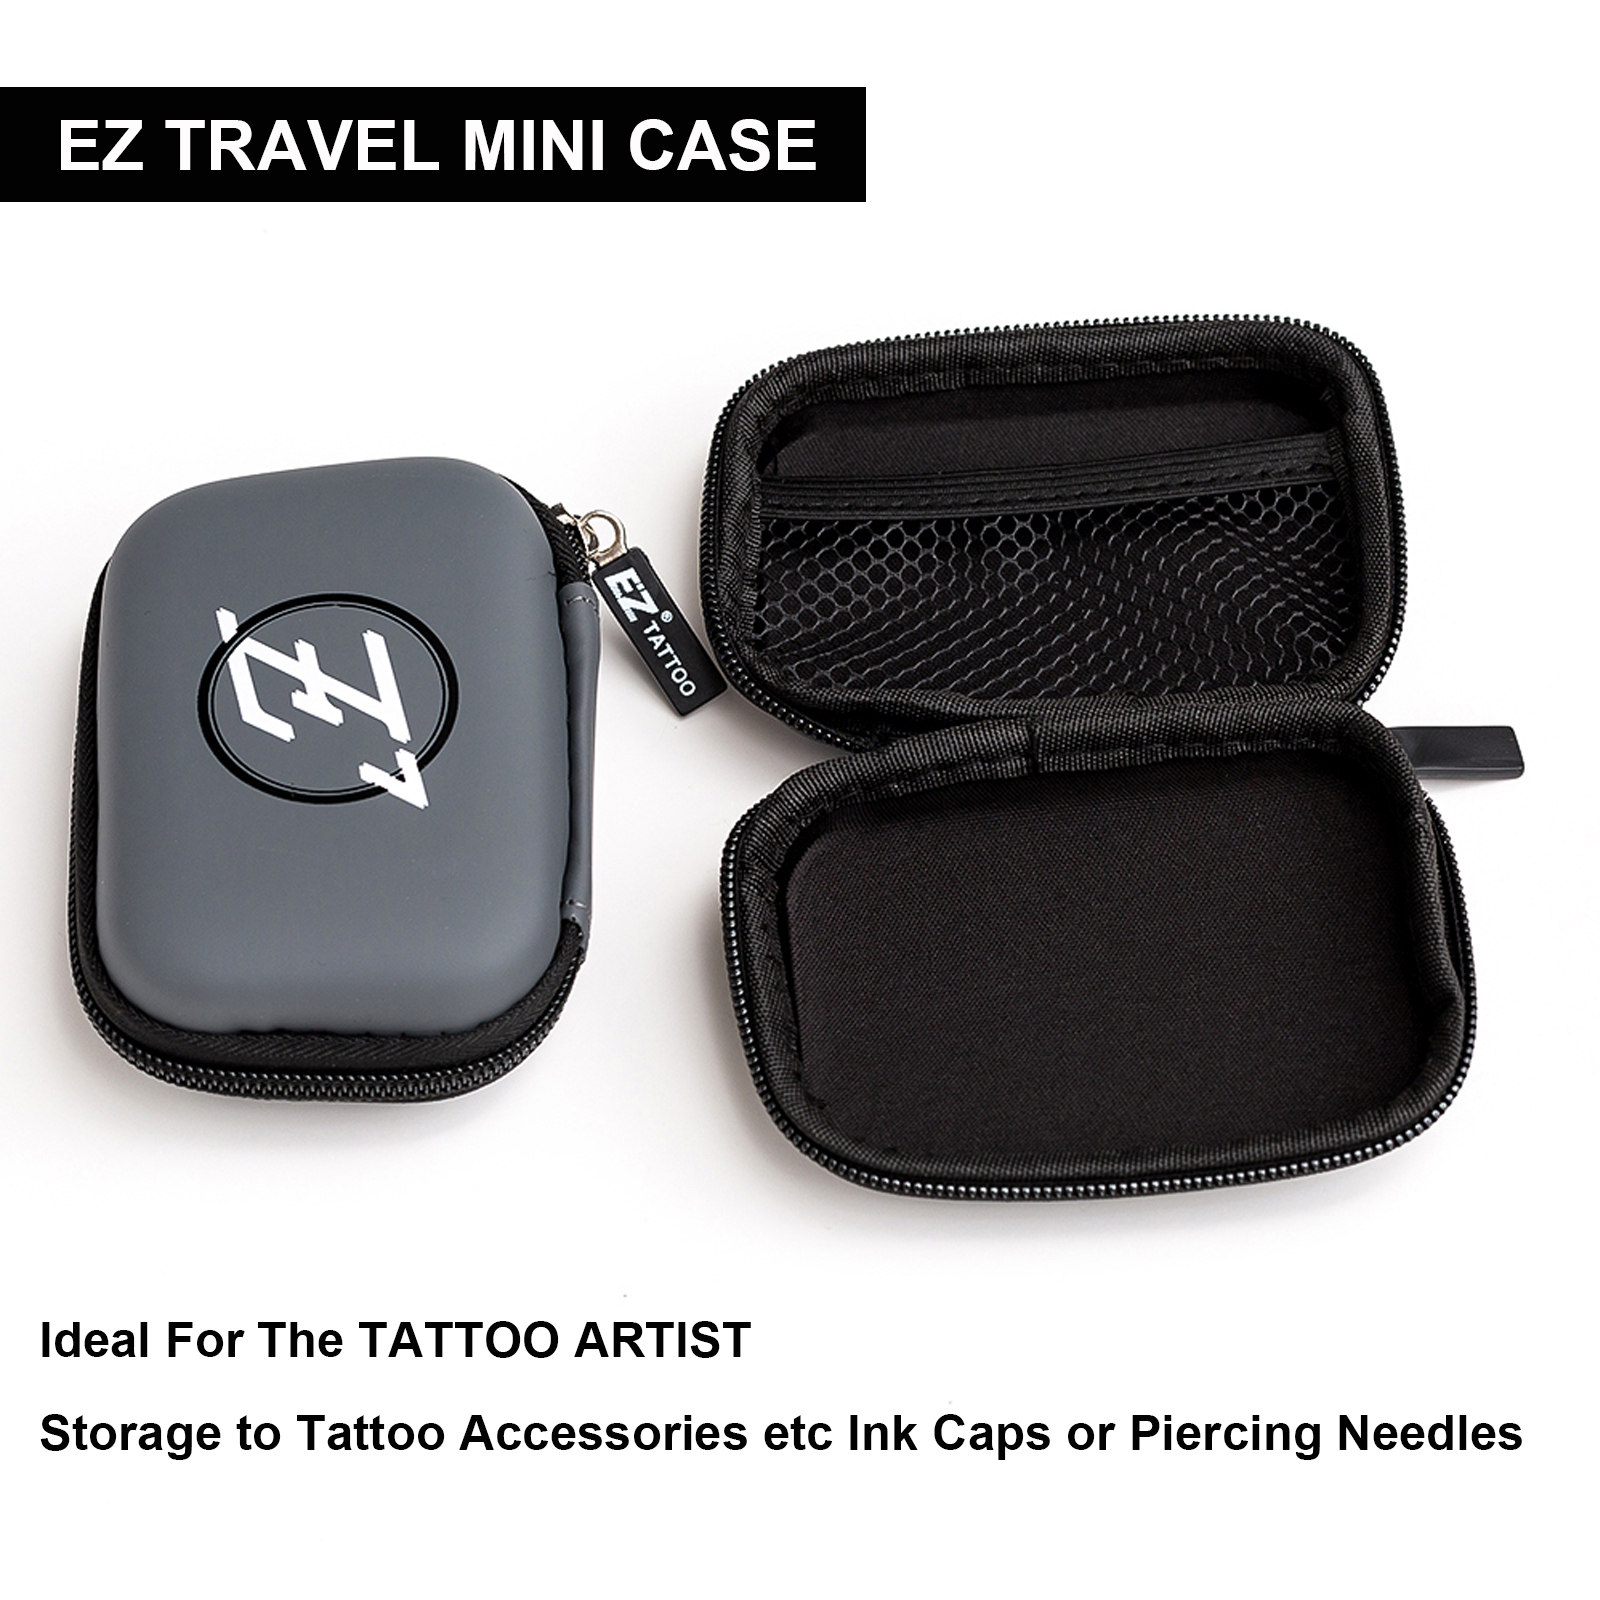 EZ Tattoo Mini Travel Case Rectangle Shaped Portable Protection Hard Case EZ Logo Zipper for Tattoo Equipment & Accessories